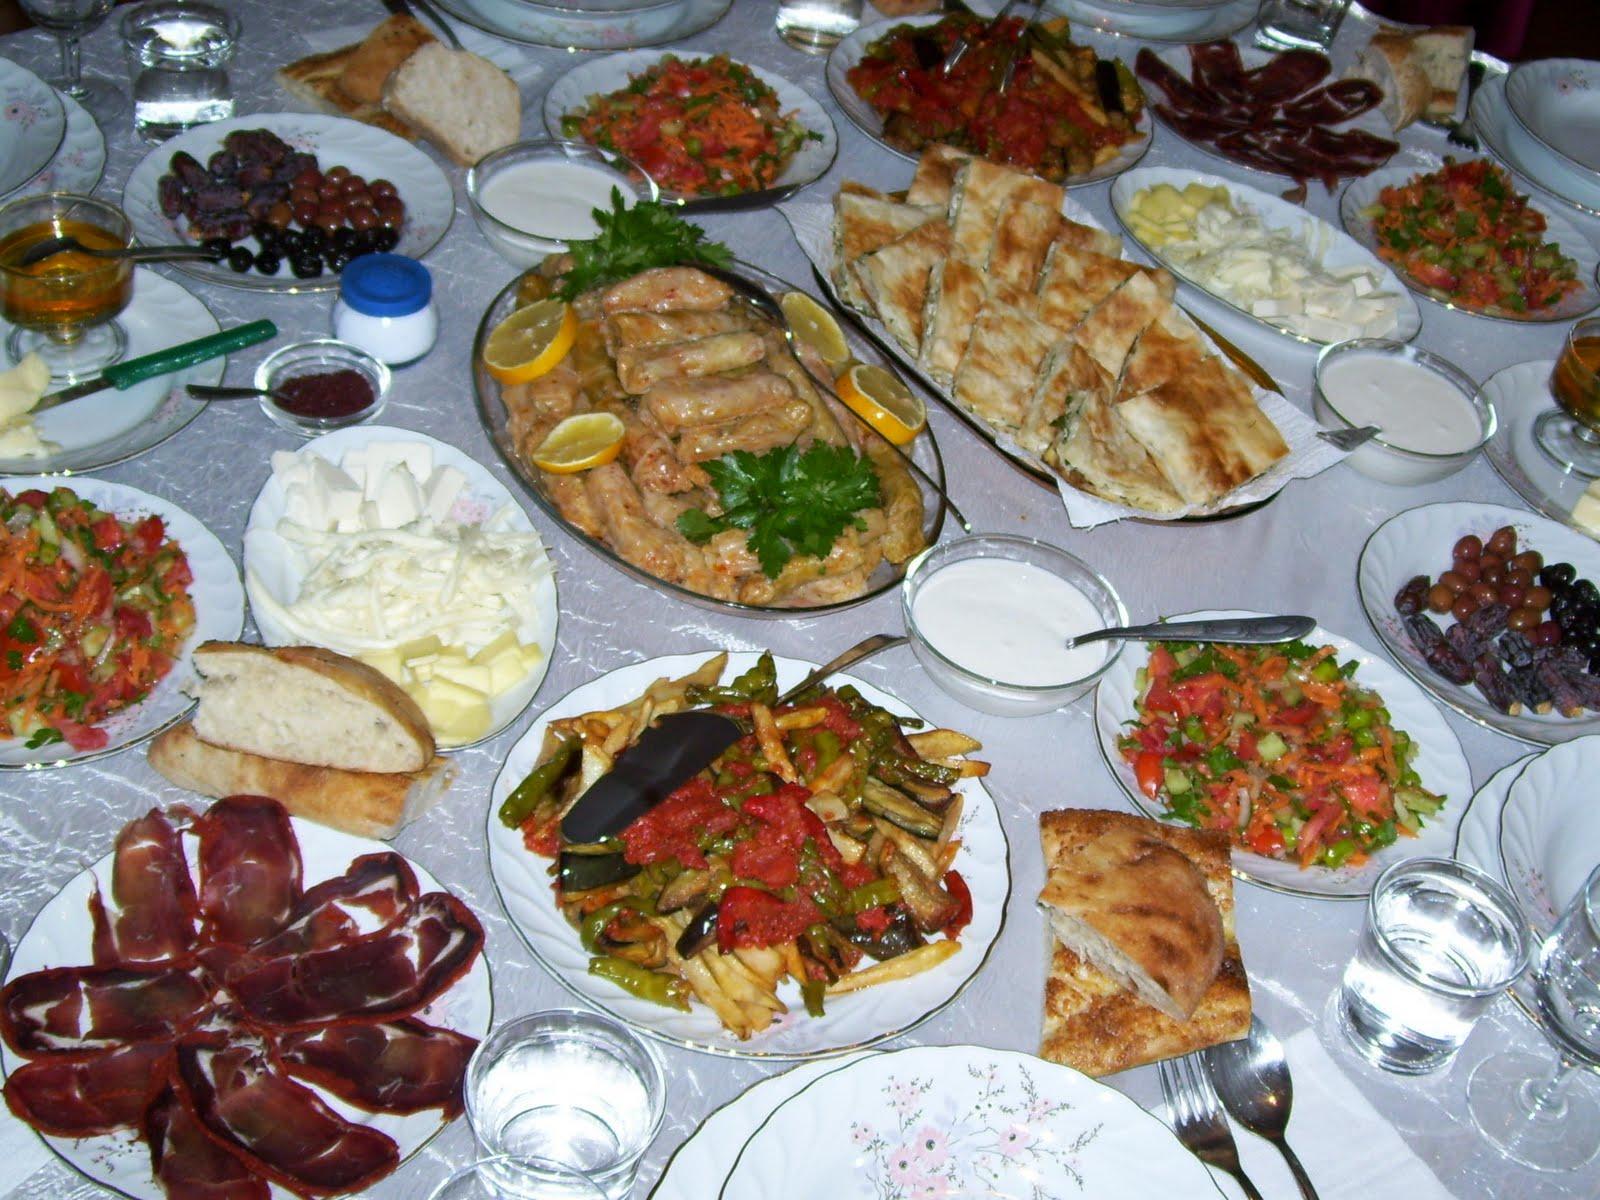 [iftar]